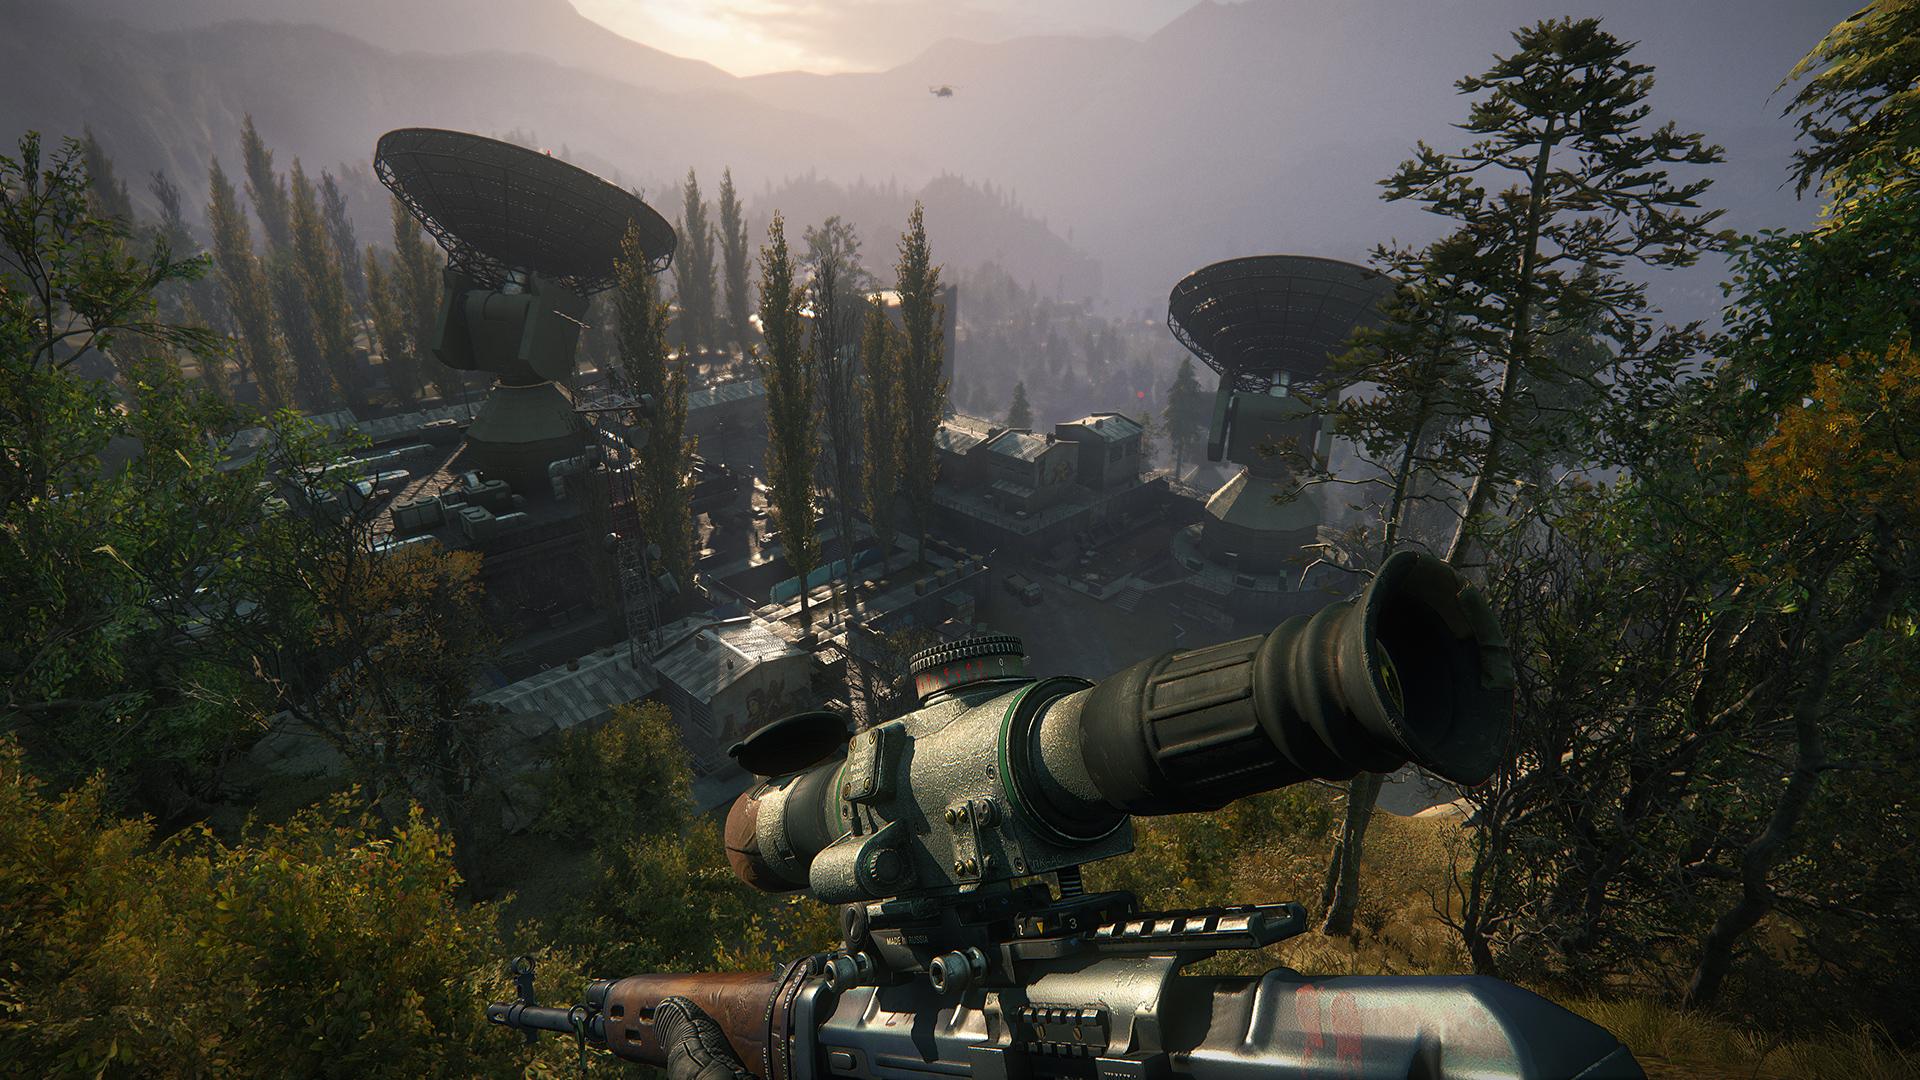 download sniper ghost warrior 3 season pass edition cracked by baldman v2 sselauncher